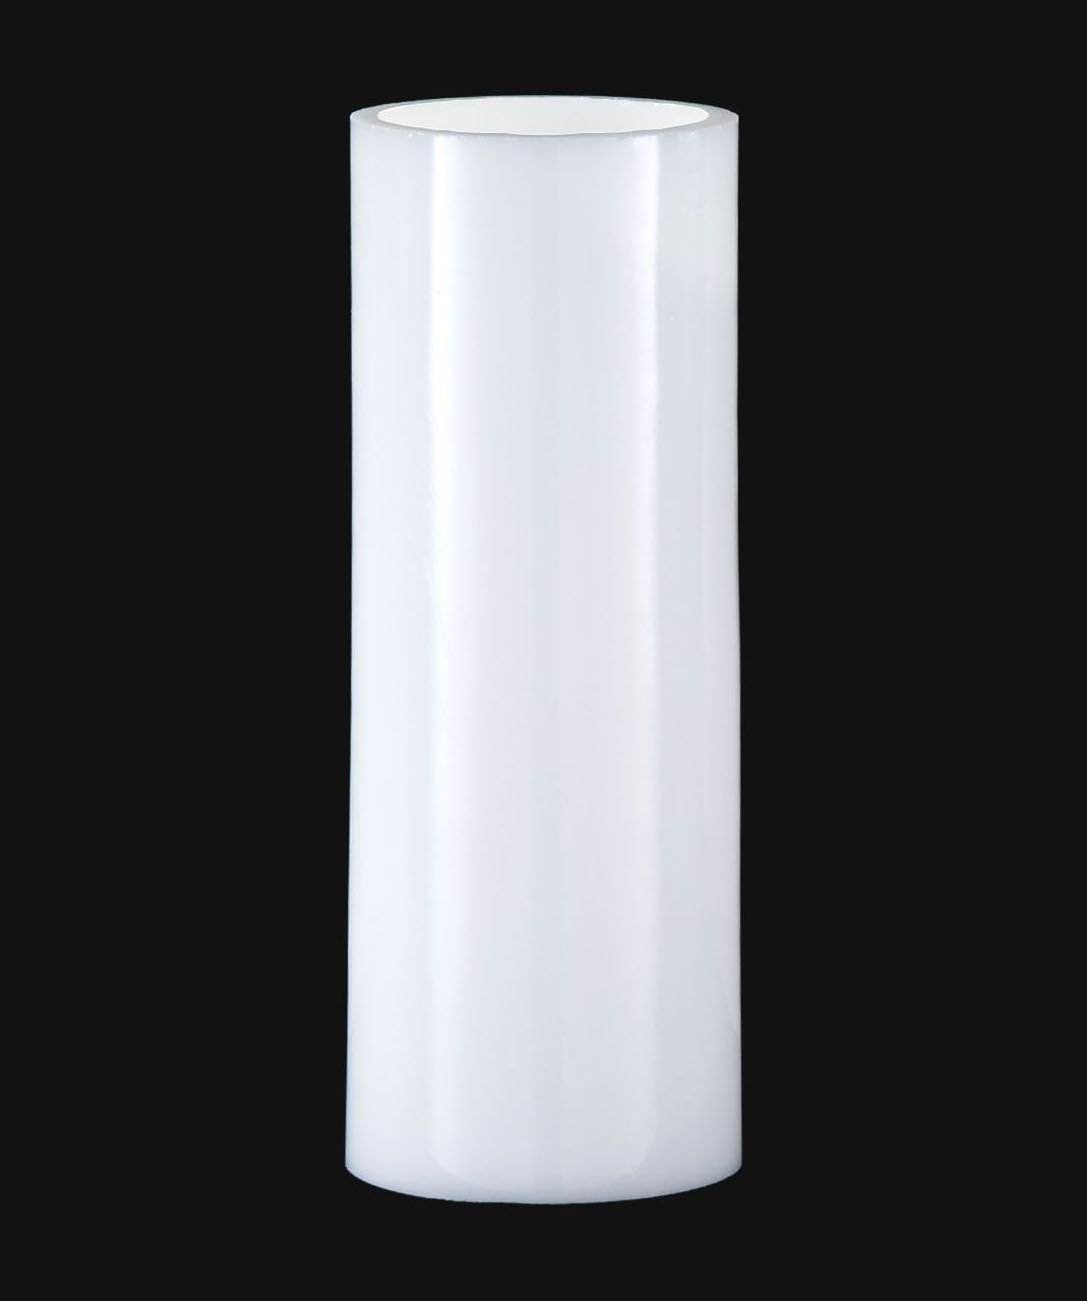 Mid Century Modern Opal Cylinder Shades 00250 B P Lamp Supply